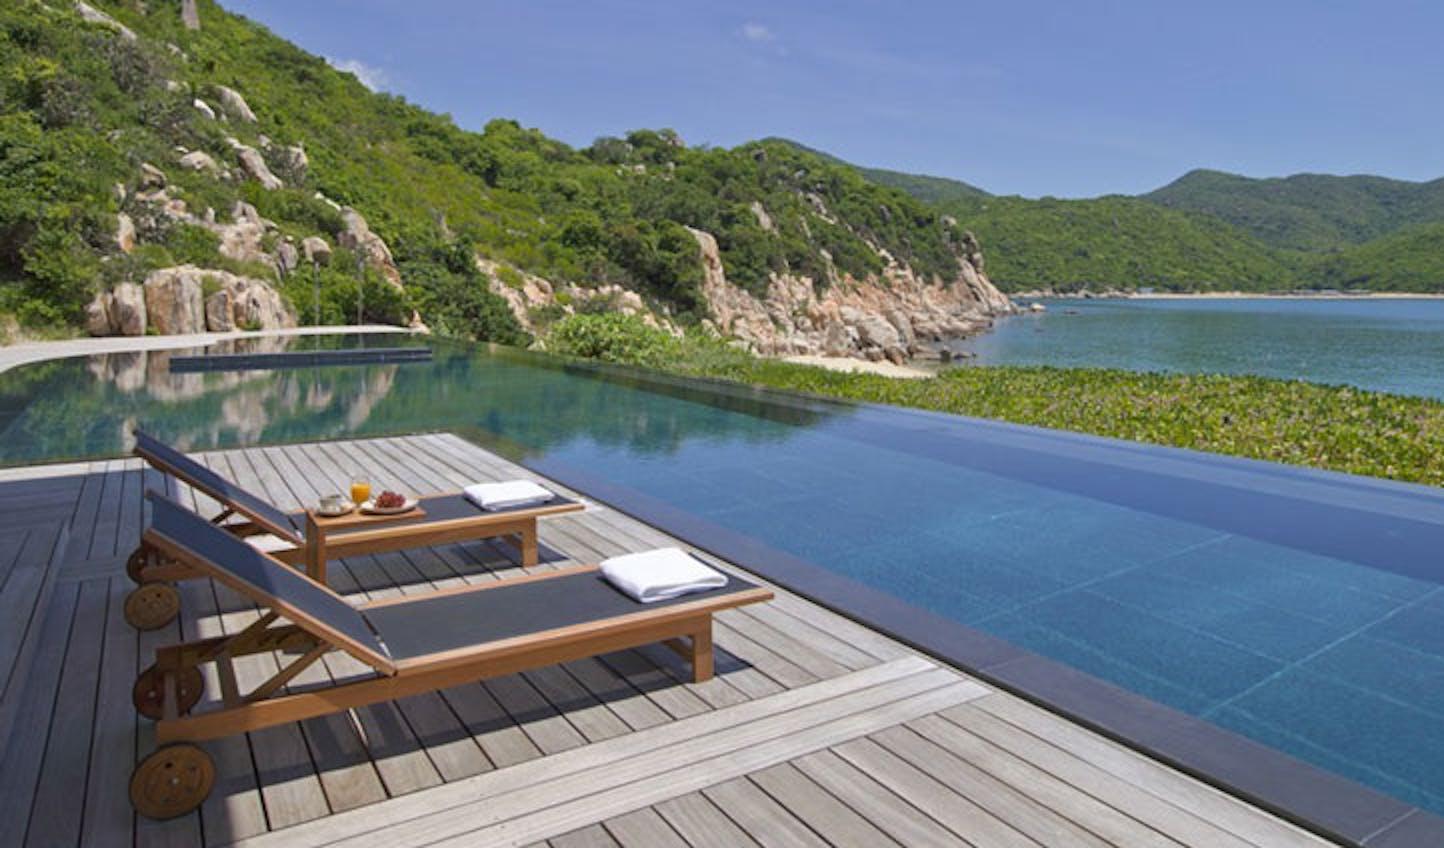 Luxury hotels in Vietnam